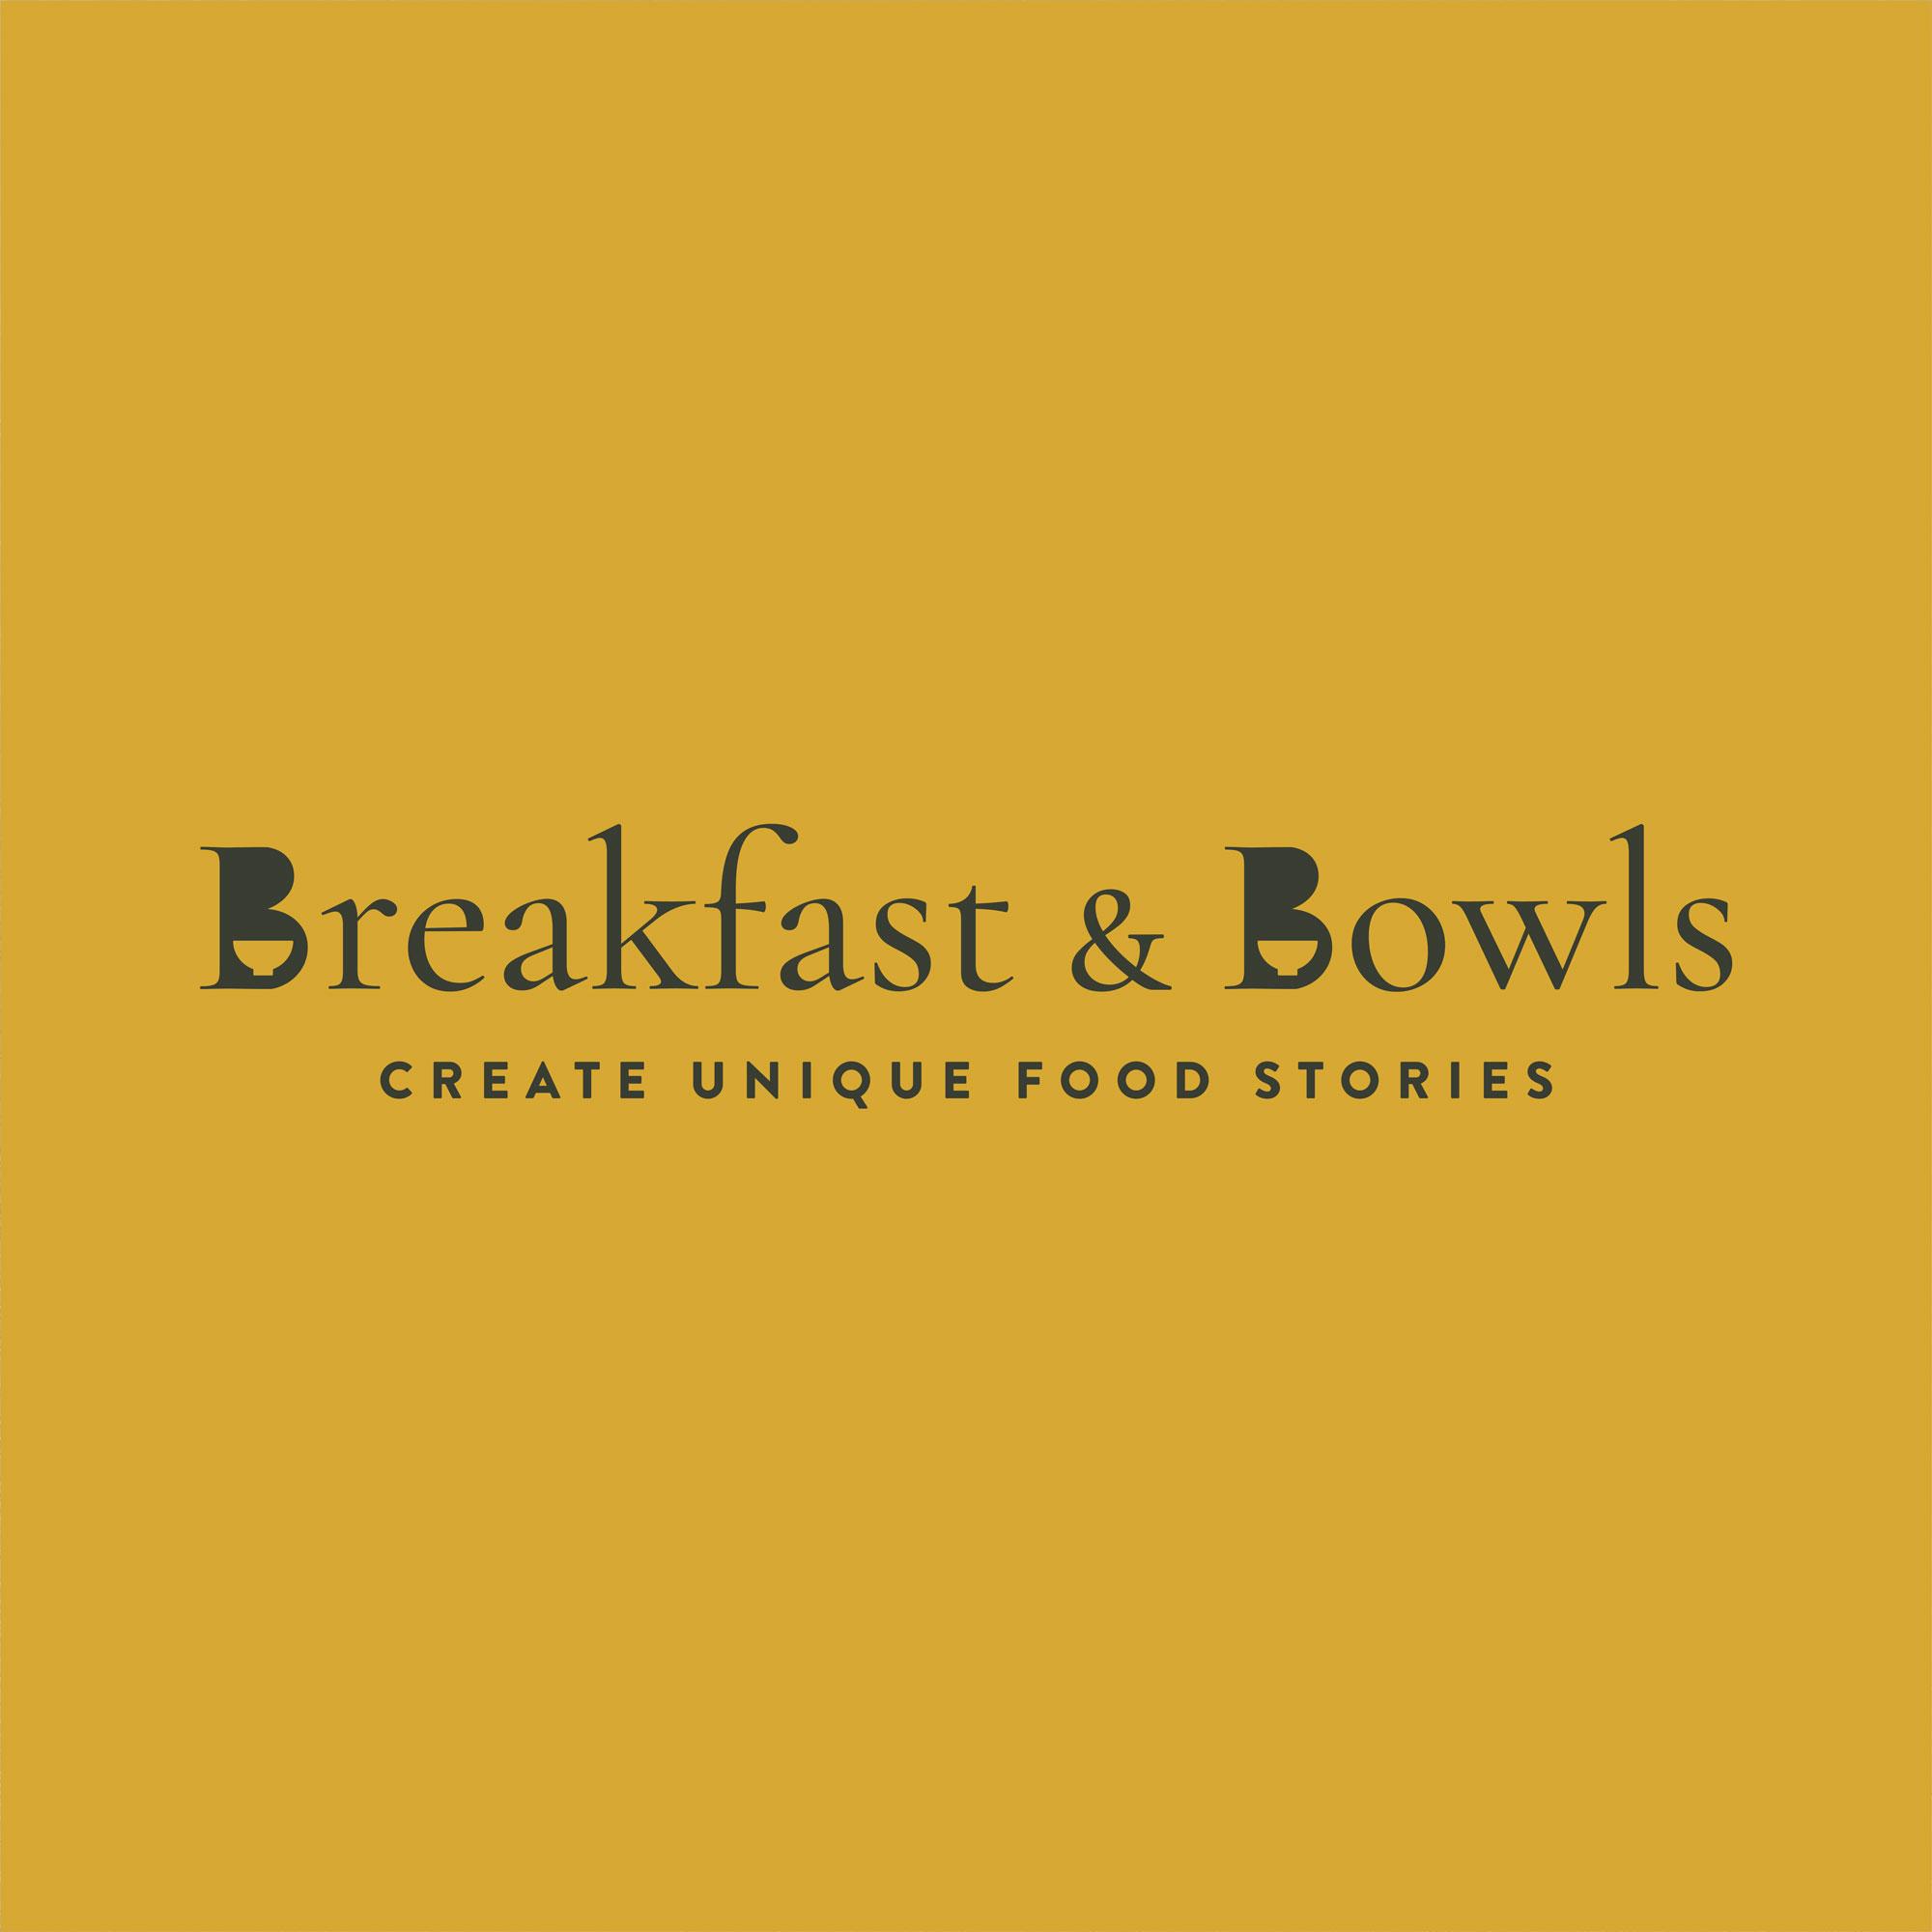 Breakfastnbowls business card